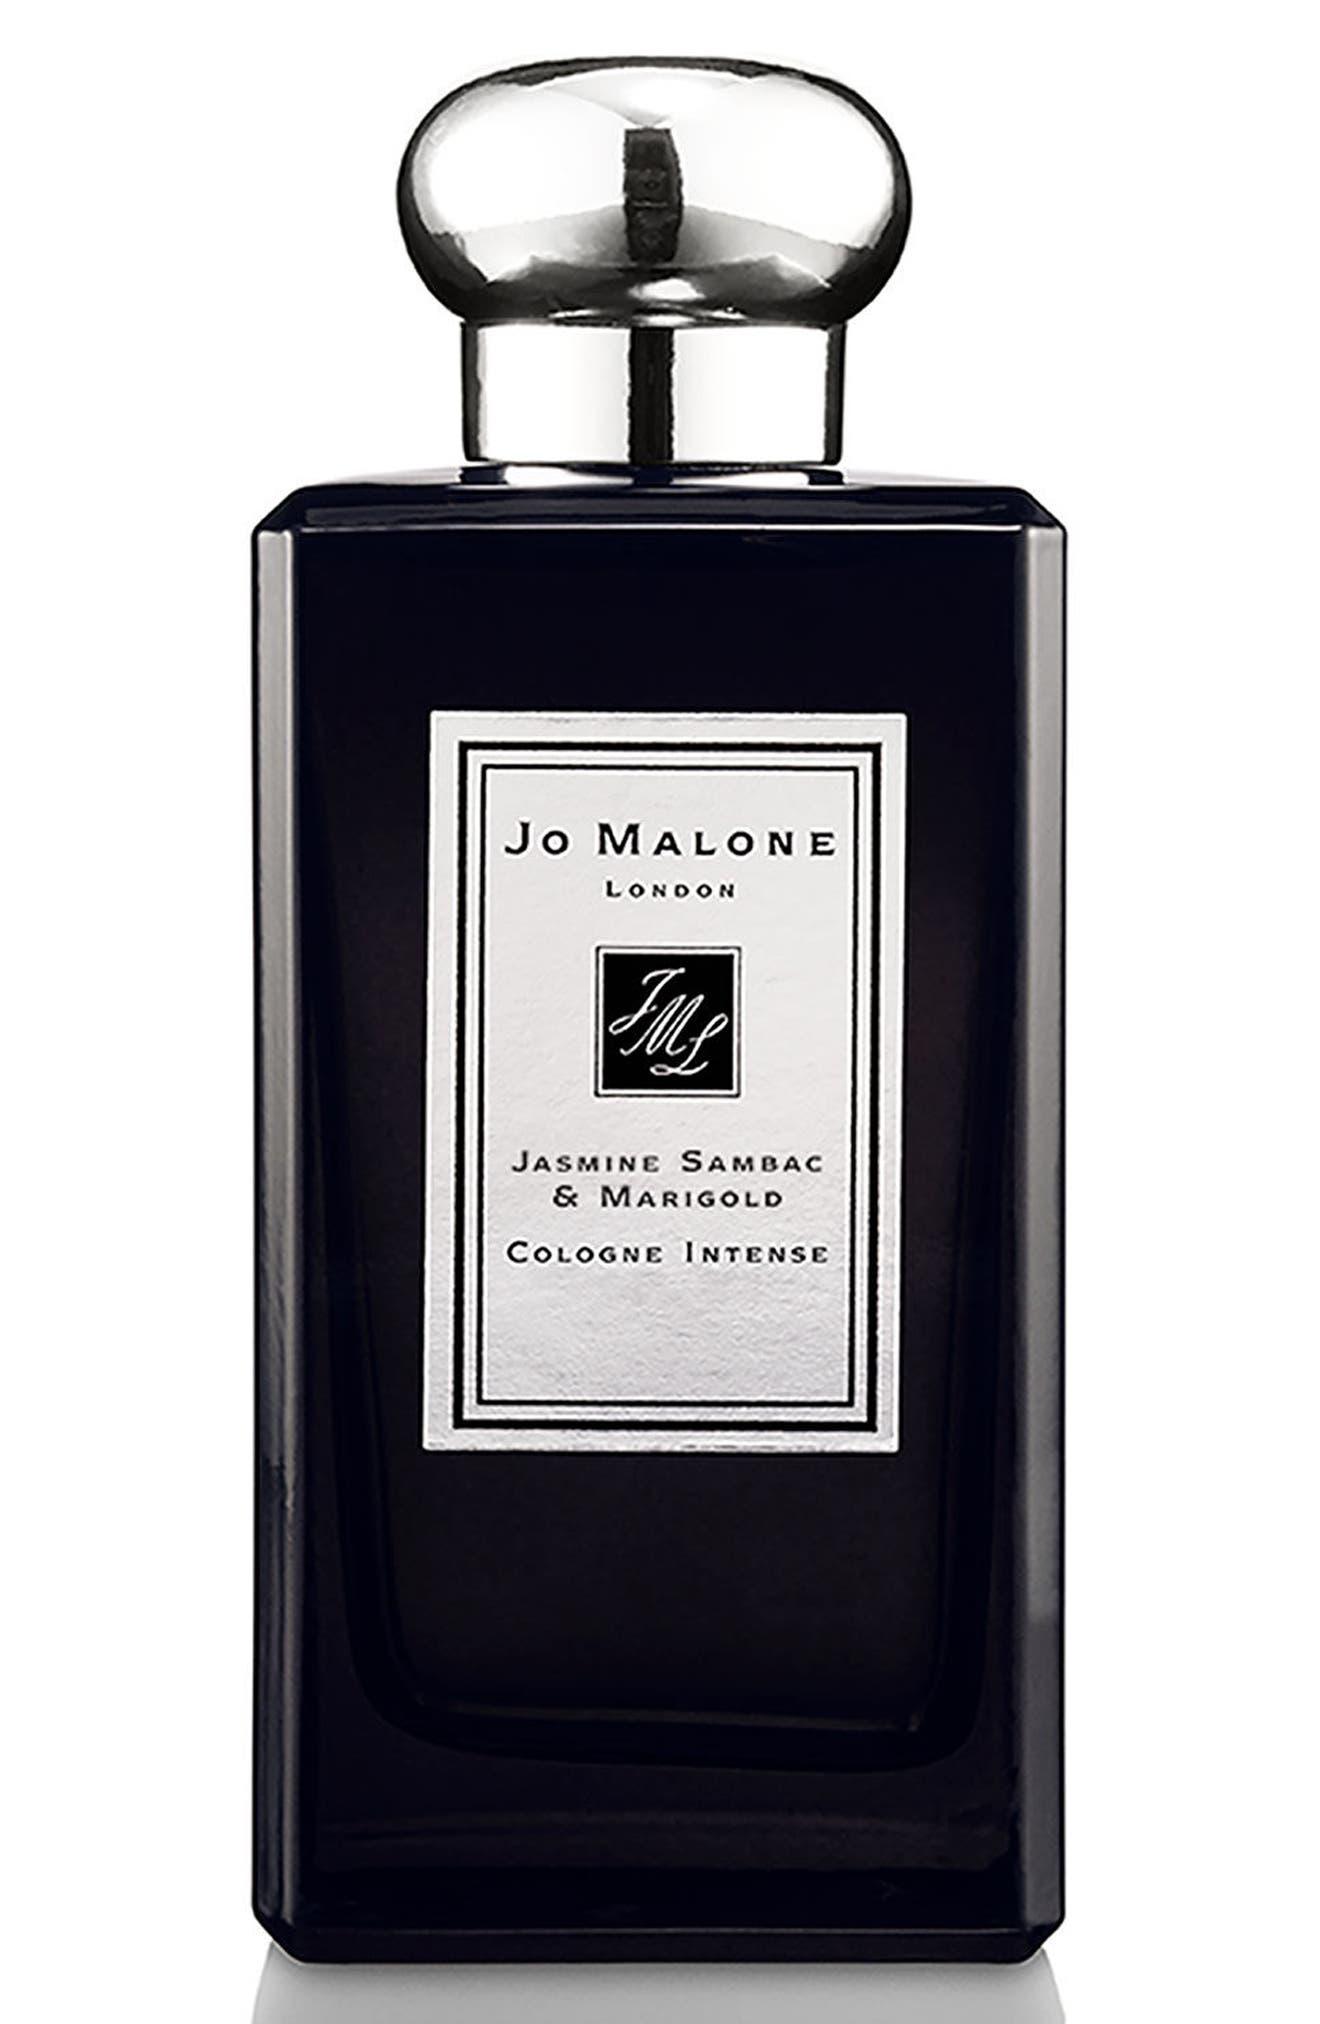 Jo Malone London(TM) Jasmine Sambac & Marigold Cologne Intense